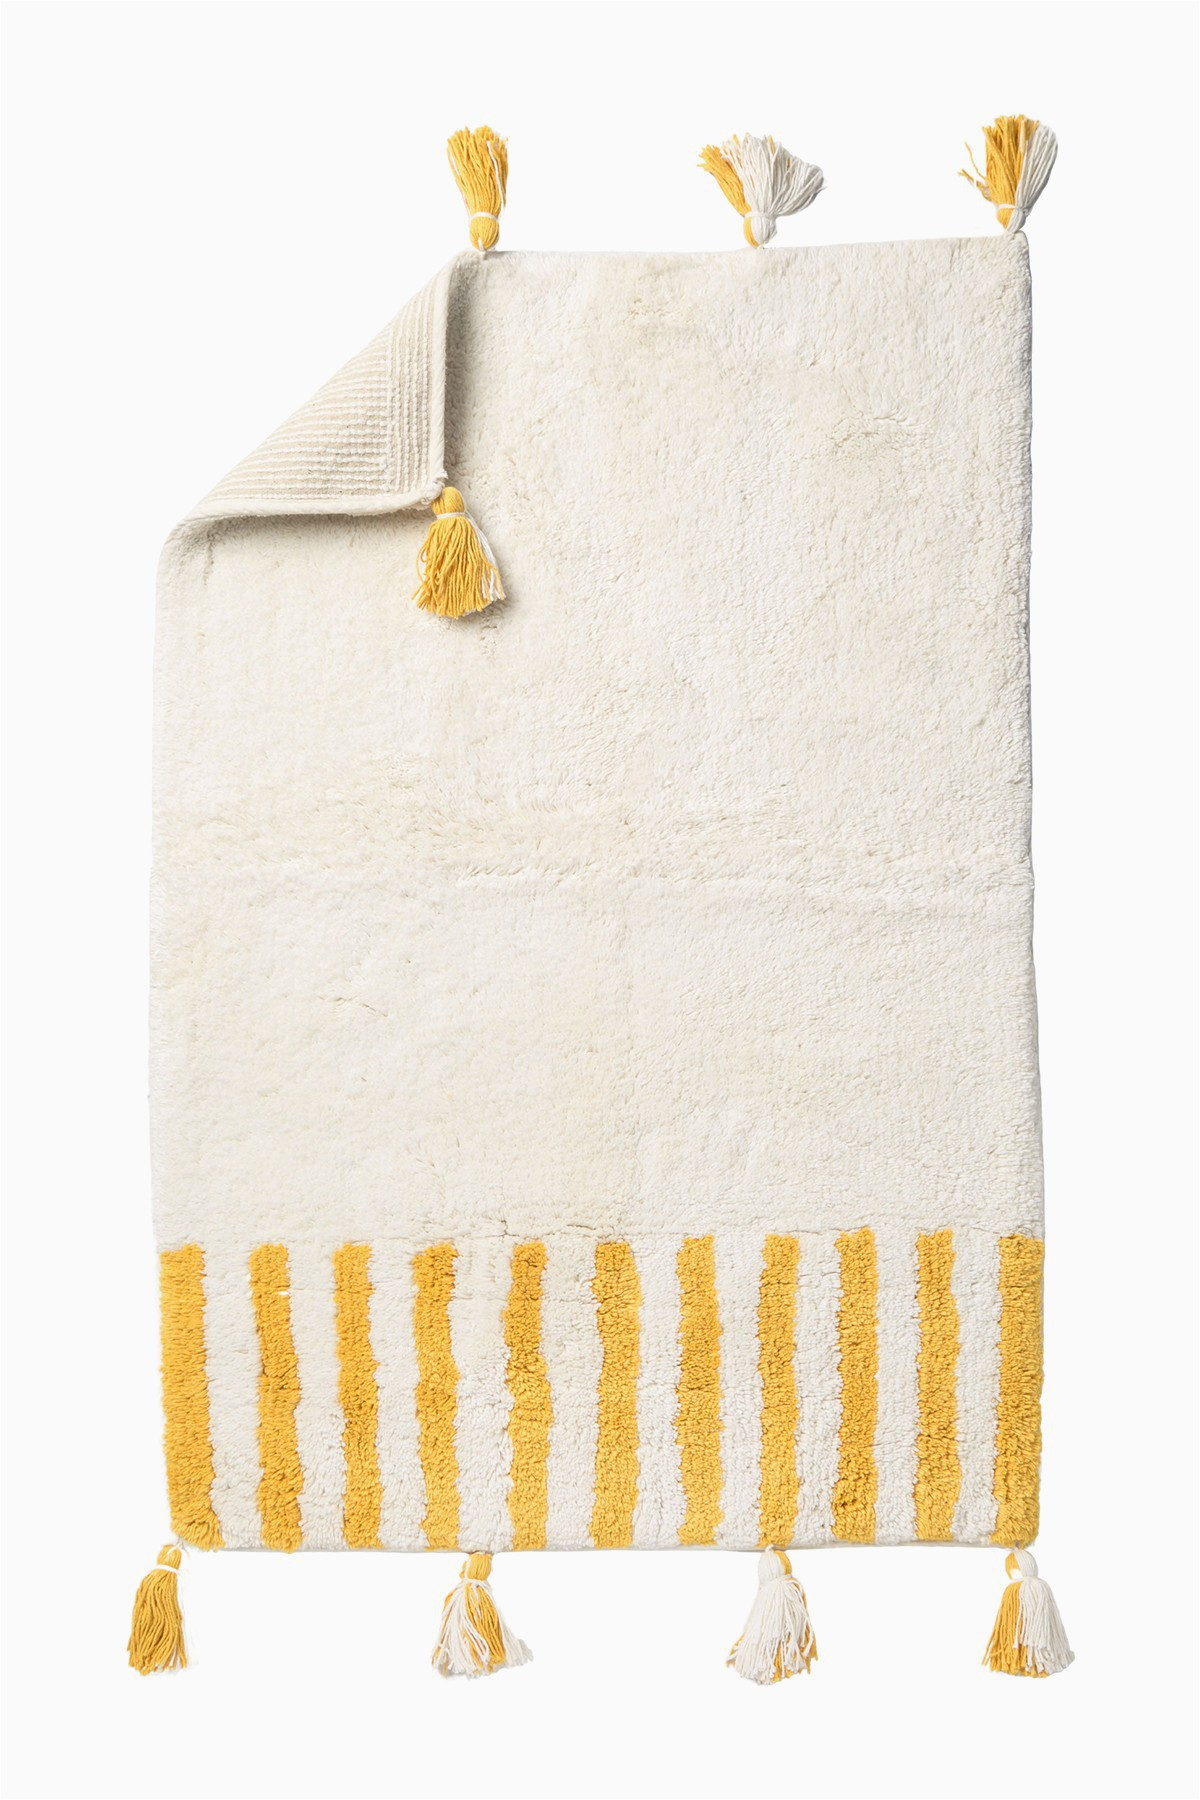 nordstrom rack offset stripe tassel bath mat 24 x 36